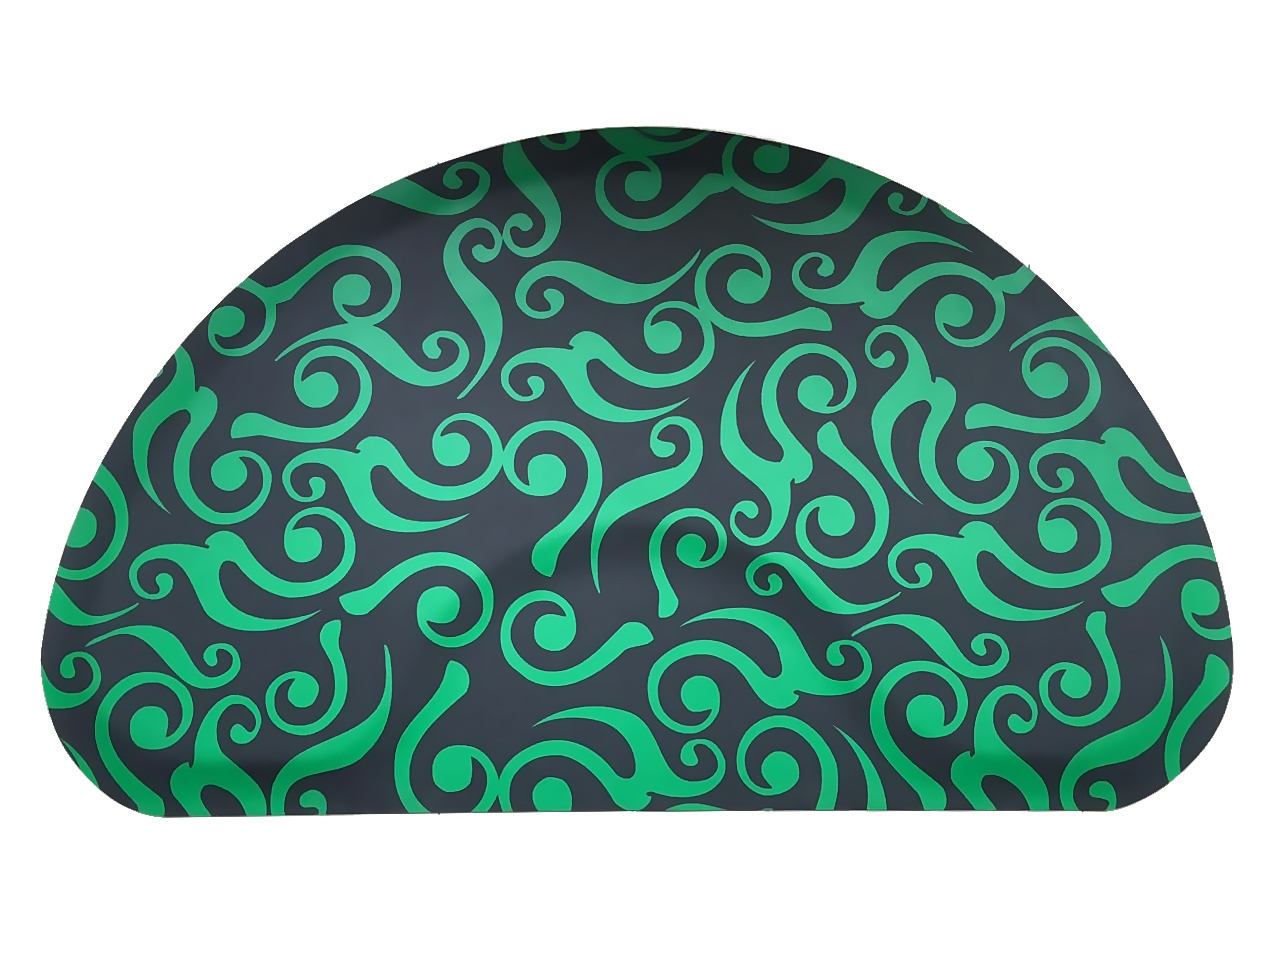 salon chair mat lounge cushion covers for sale anti fatigue manufacturer wholesaler